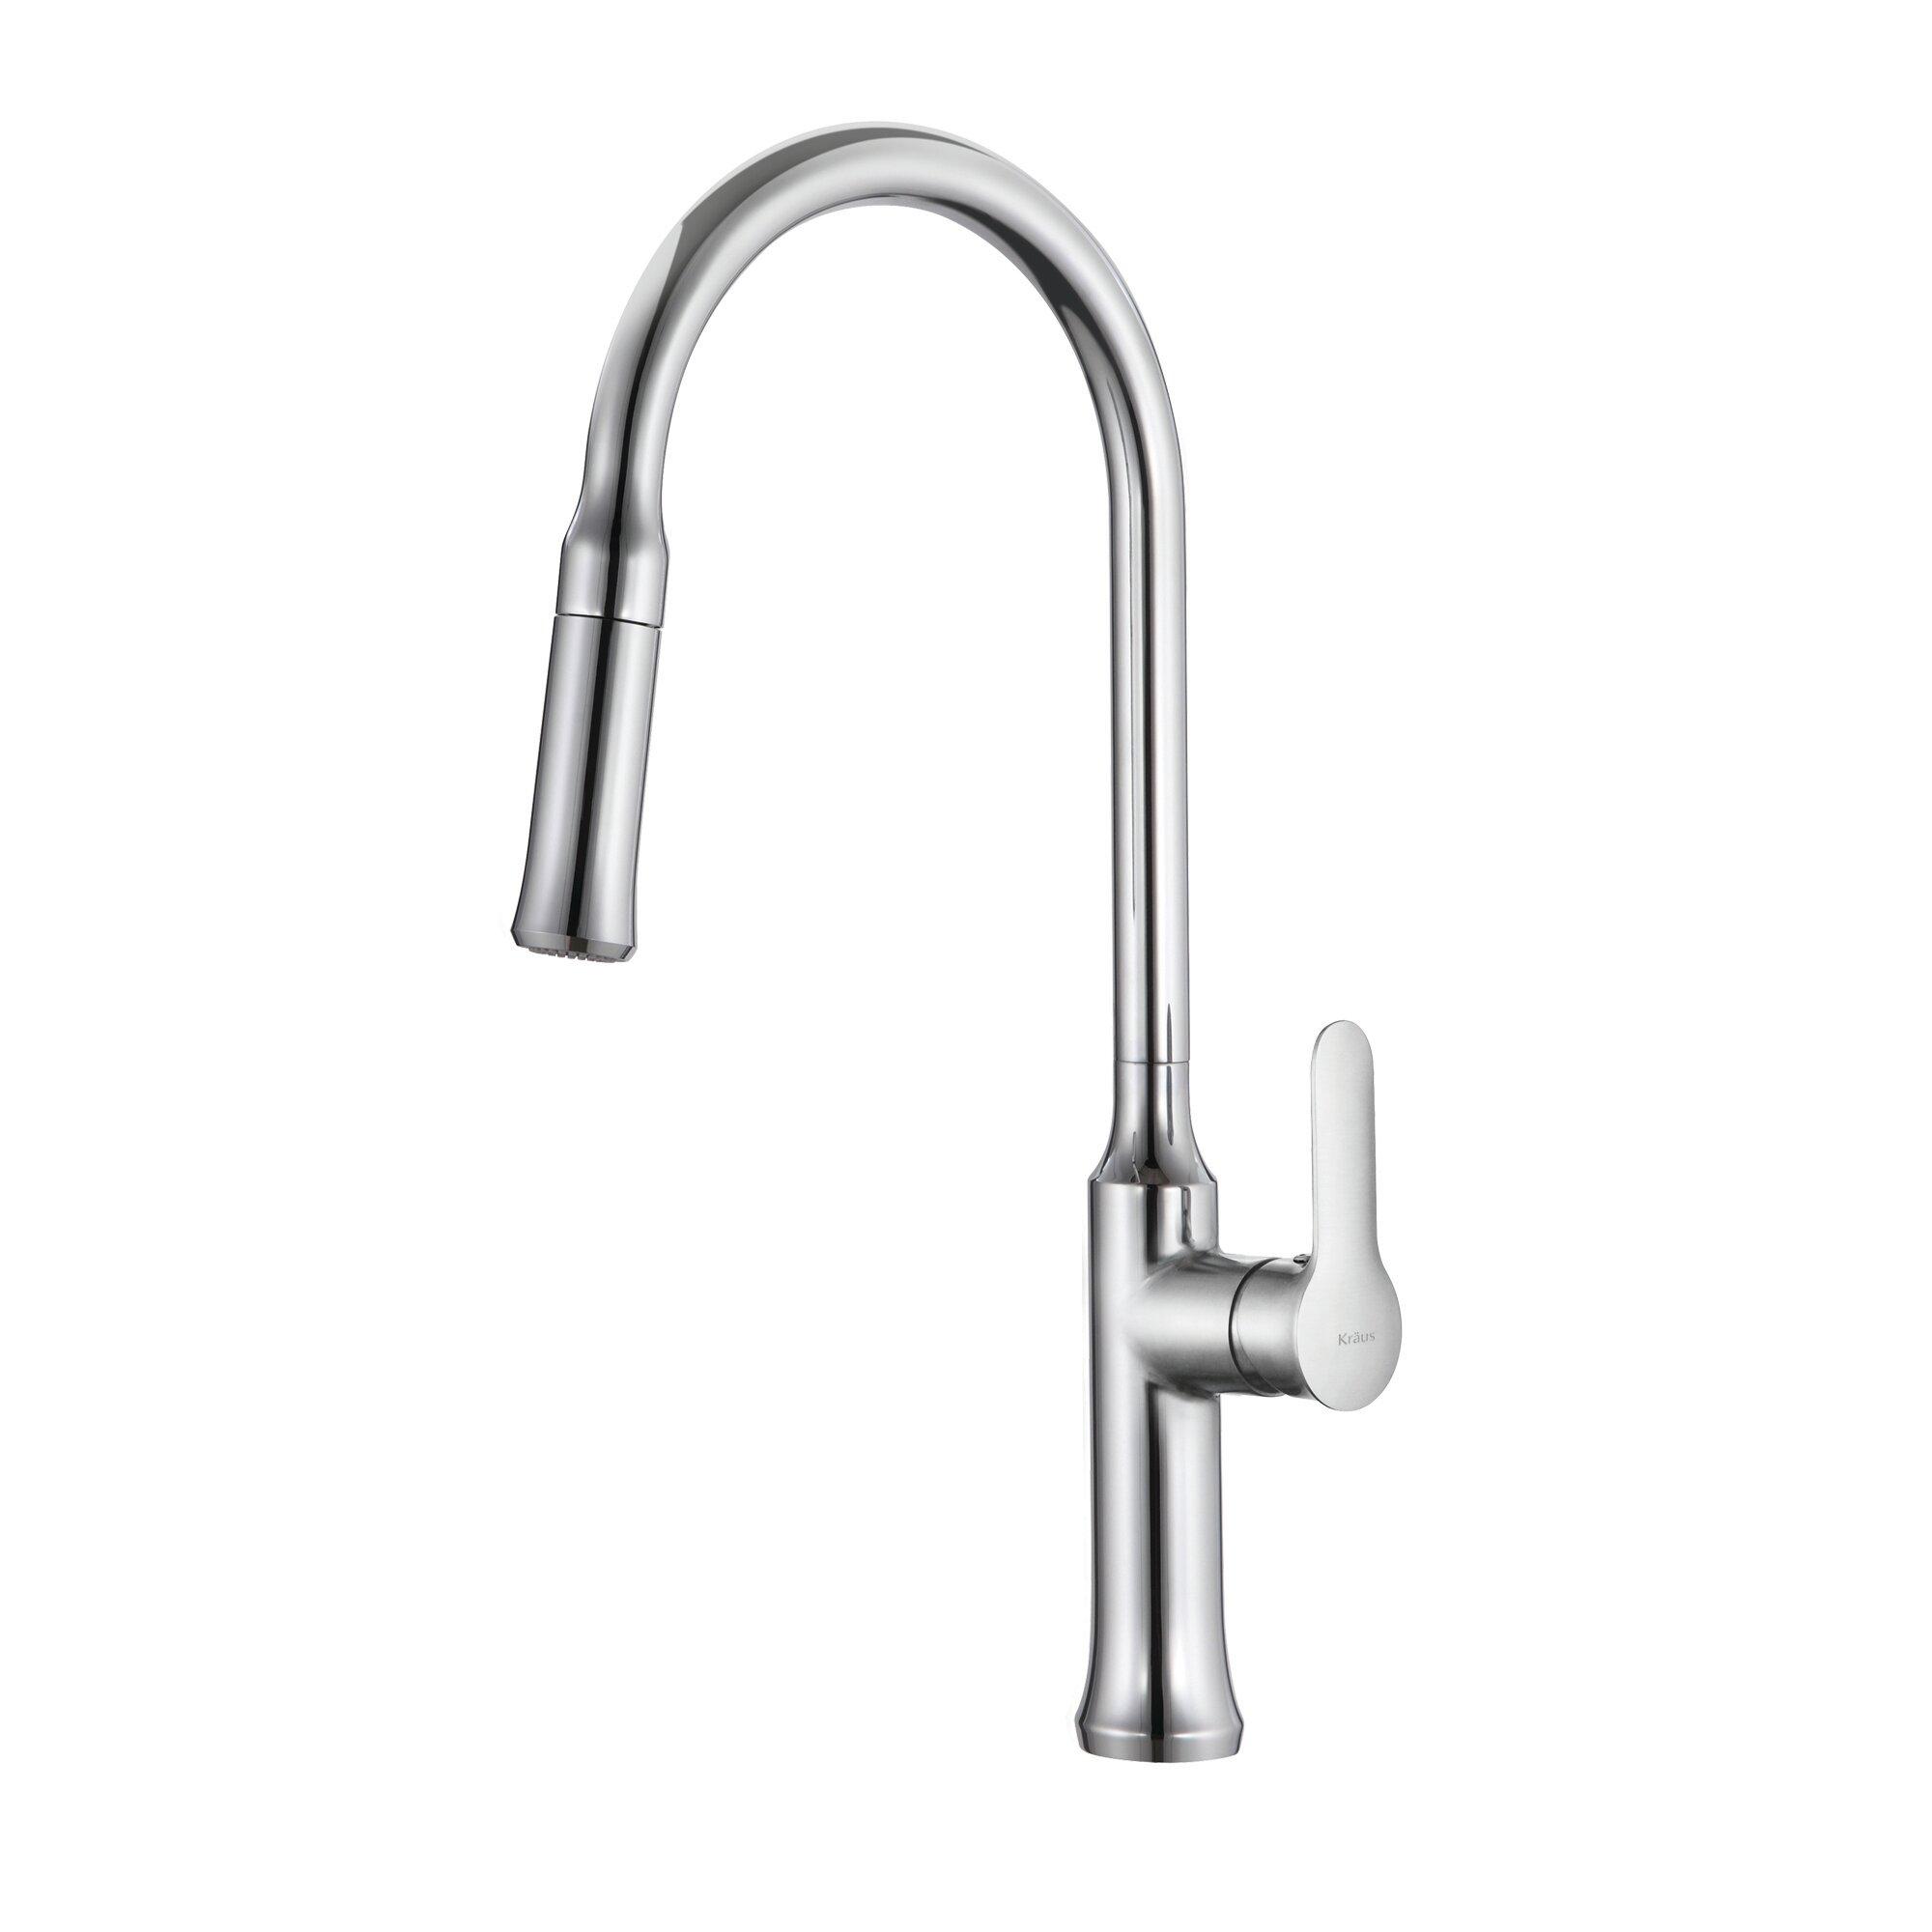 Details about Kraus Nola? Single Lever Pull-down Kitchen Faucet